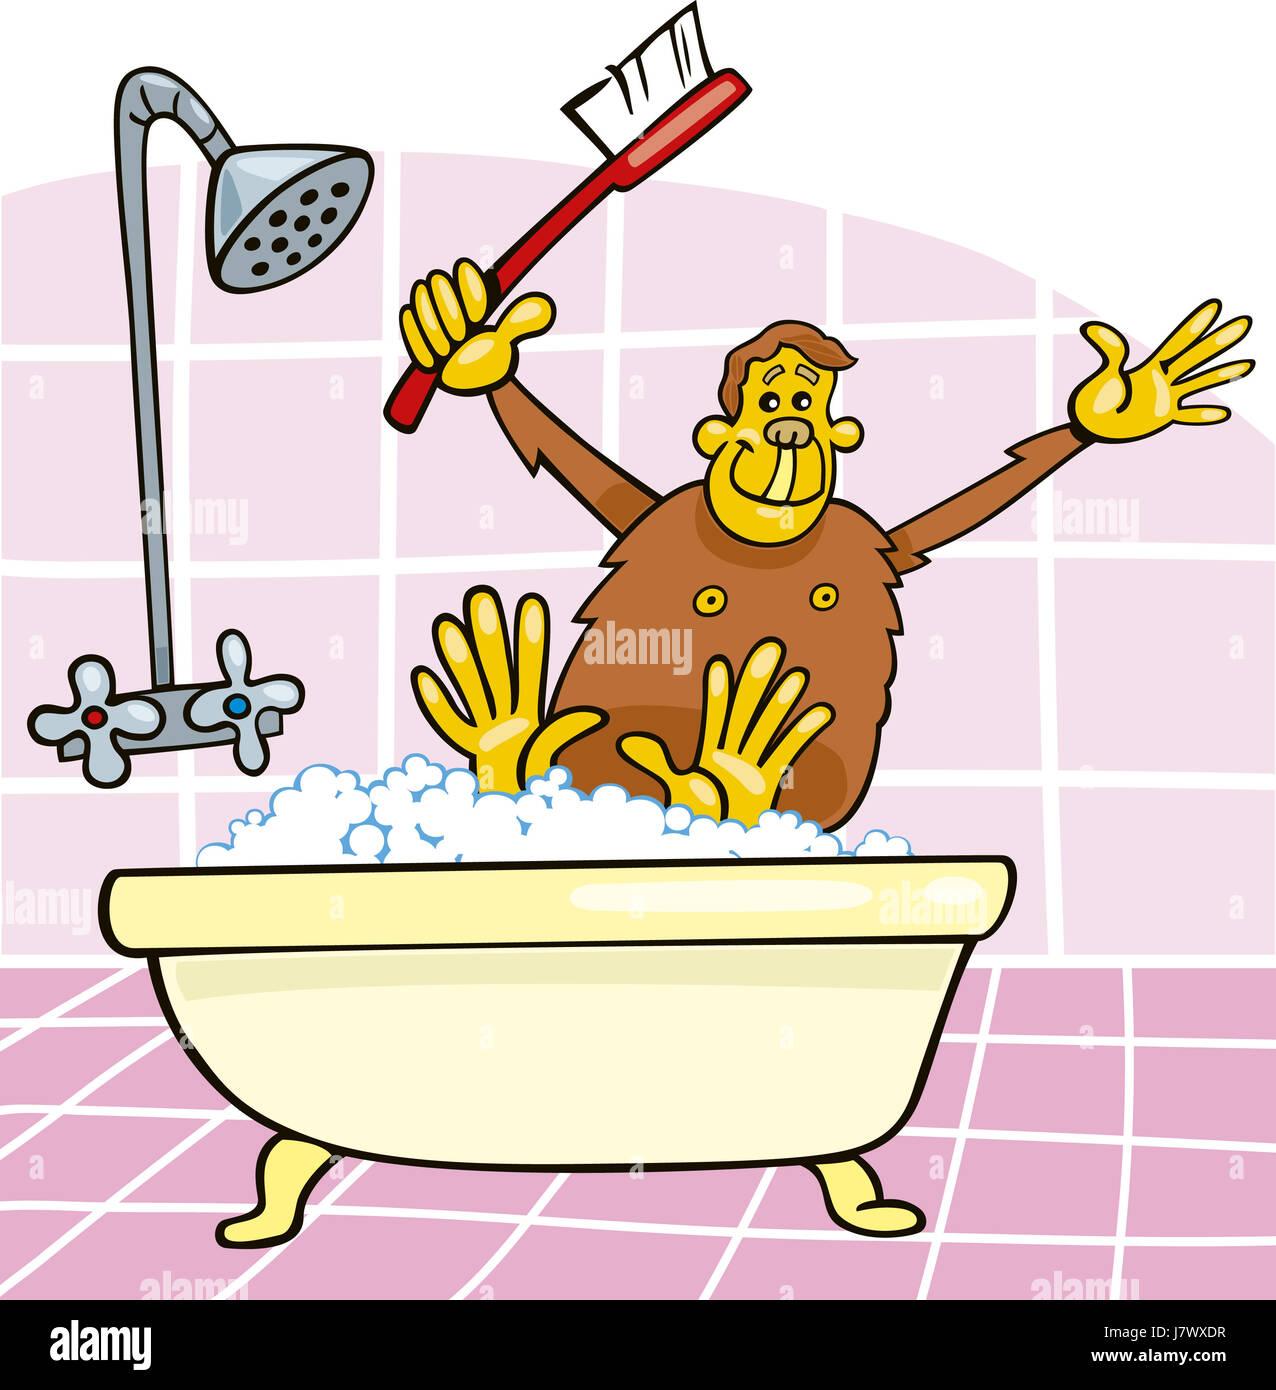 Affe Abbildung Lustige Bad Badewanne Badewanne Badewanne Humorvollen